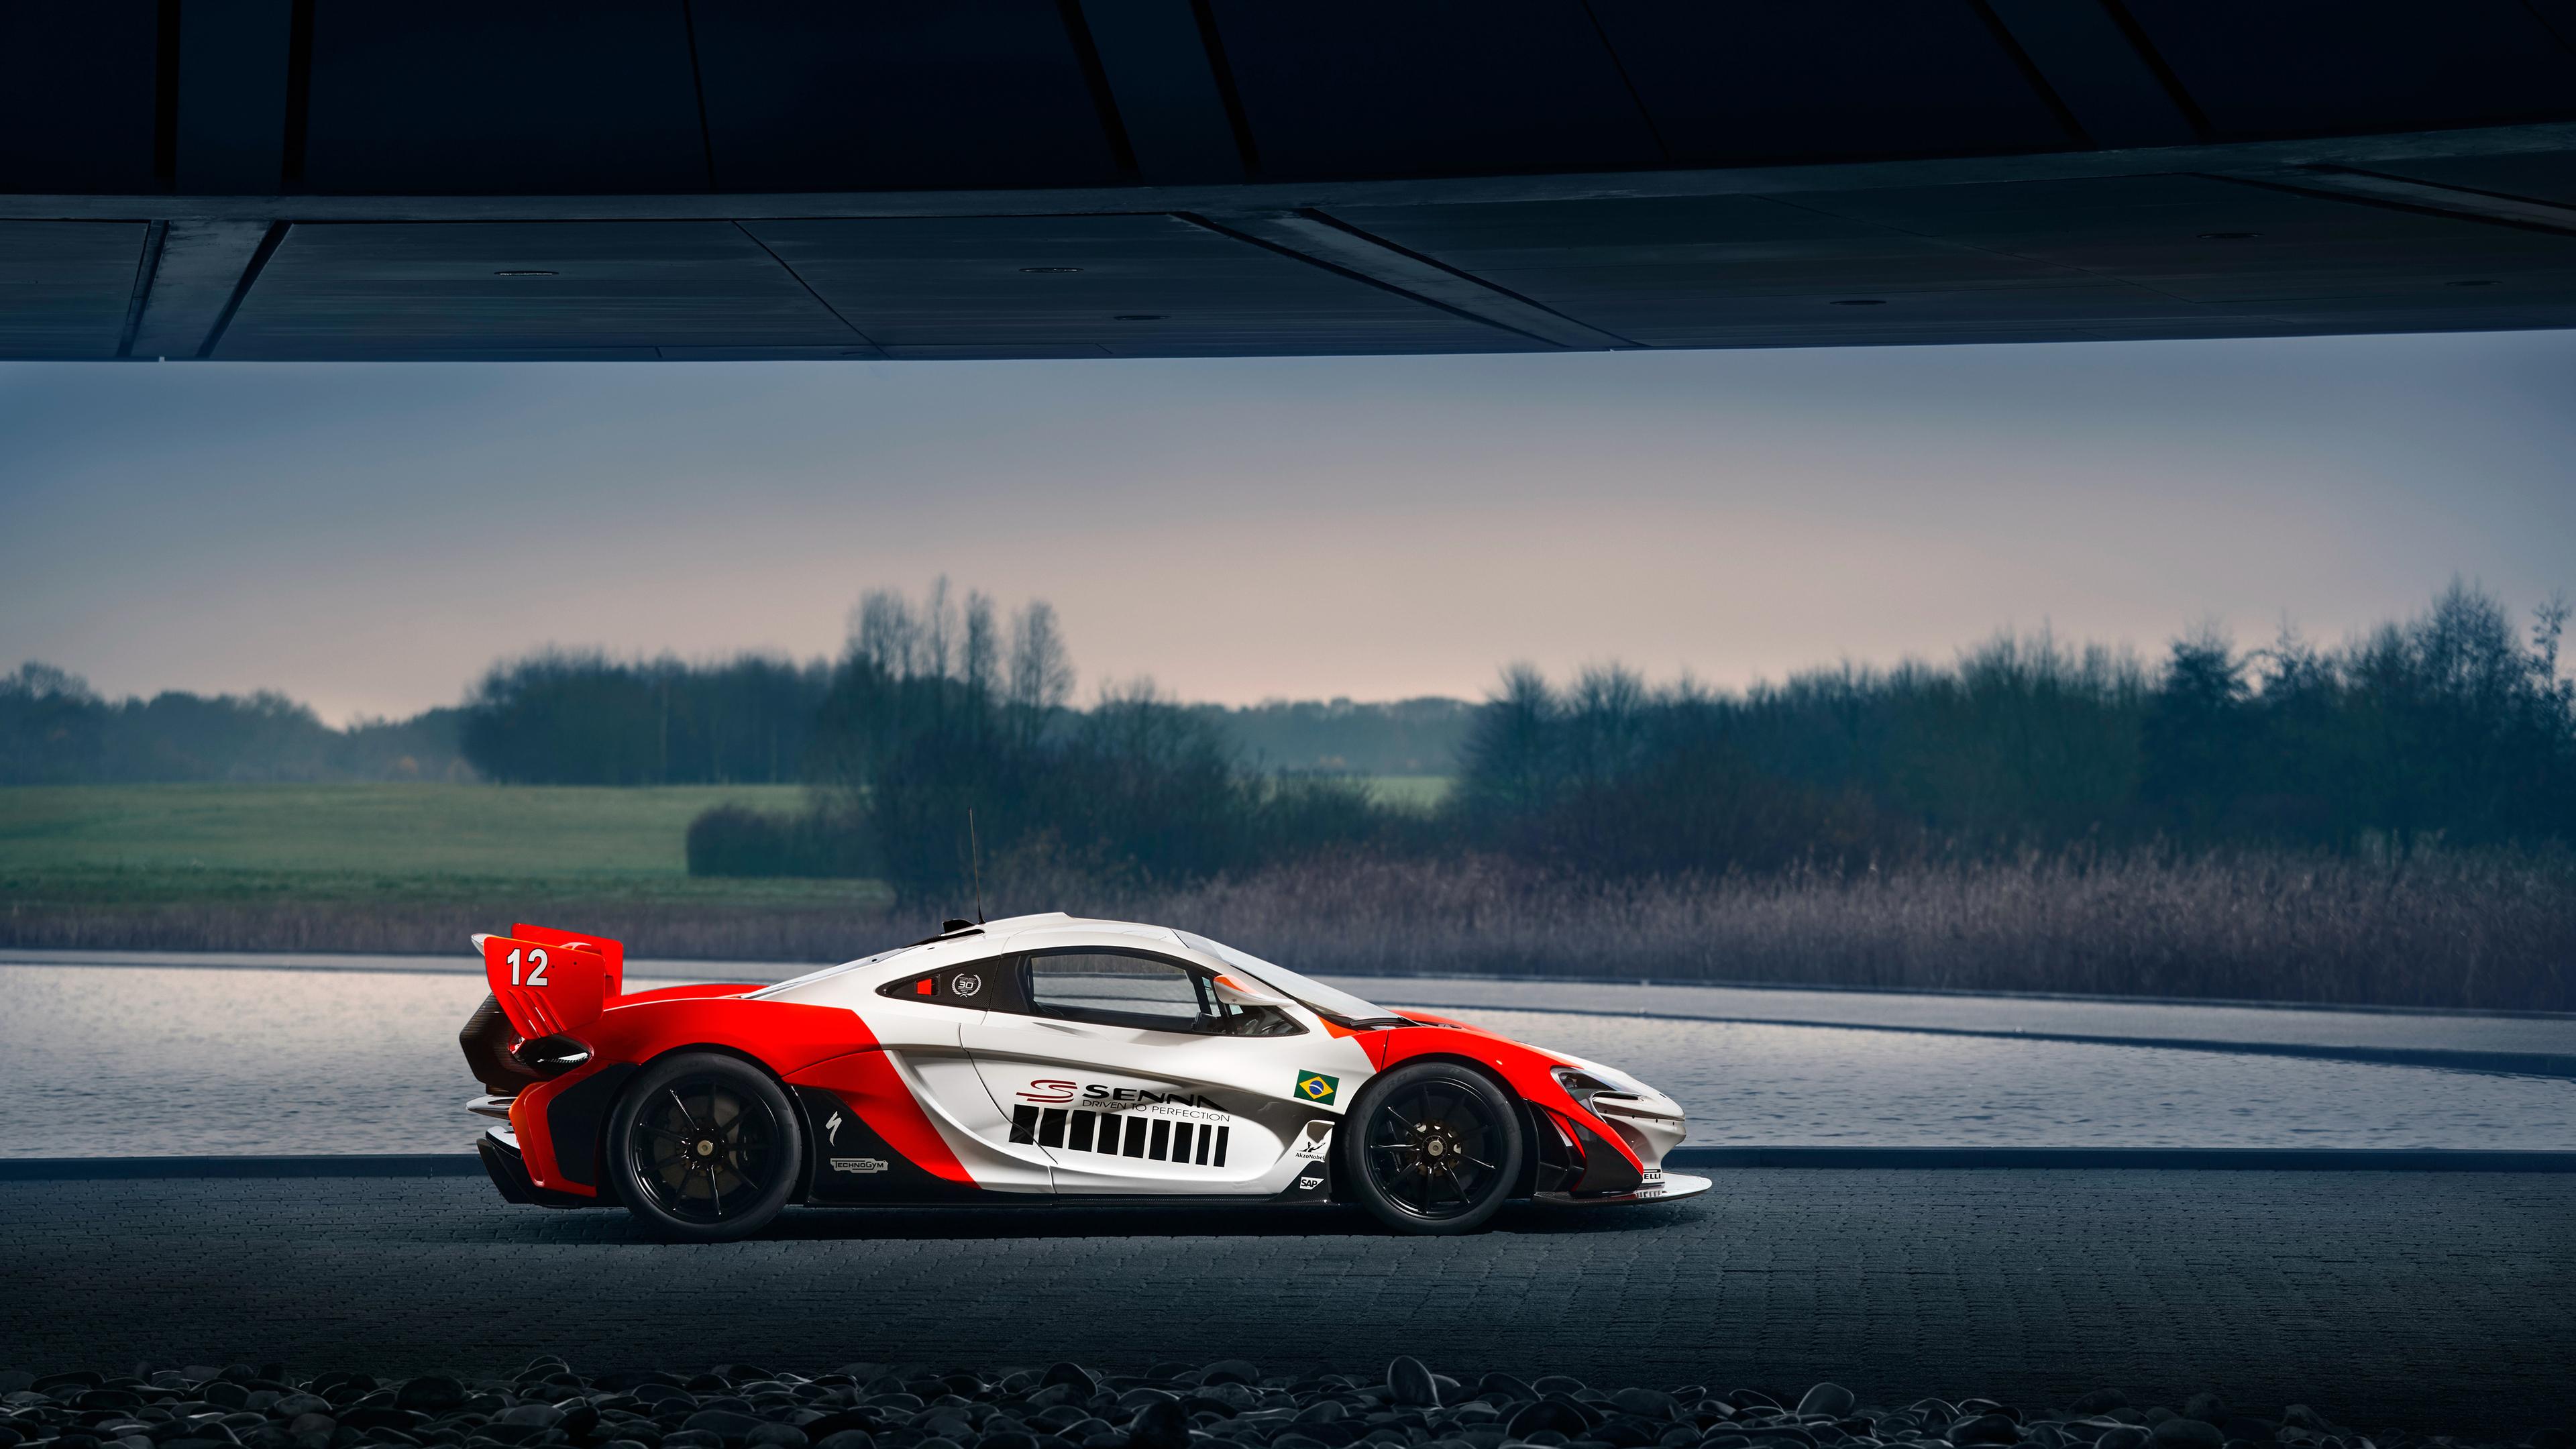 mclaren mso p1 gtr ayrton senna 2018 side view 4k 1546362393 - McLaren MSO P1 GTR Ayrton Senna 2018 Side View 4k - mclaren wallpapers, hd-wallpapers, cars wallpapers, 4k-wallpapers, 2018 cars wallpapers